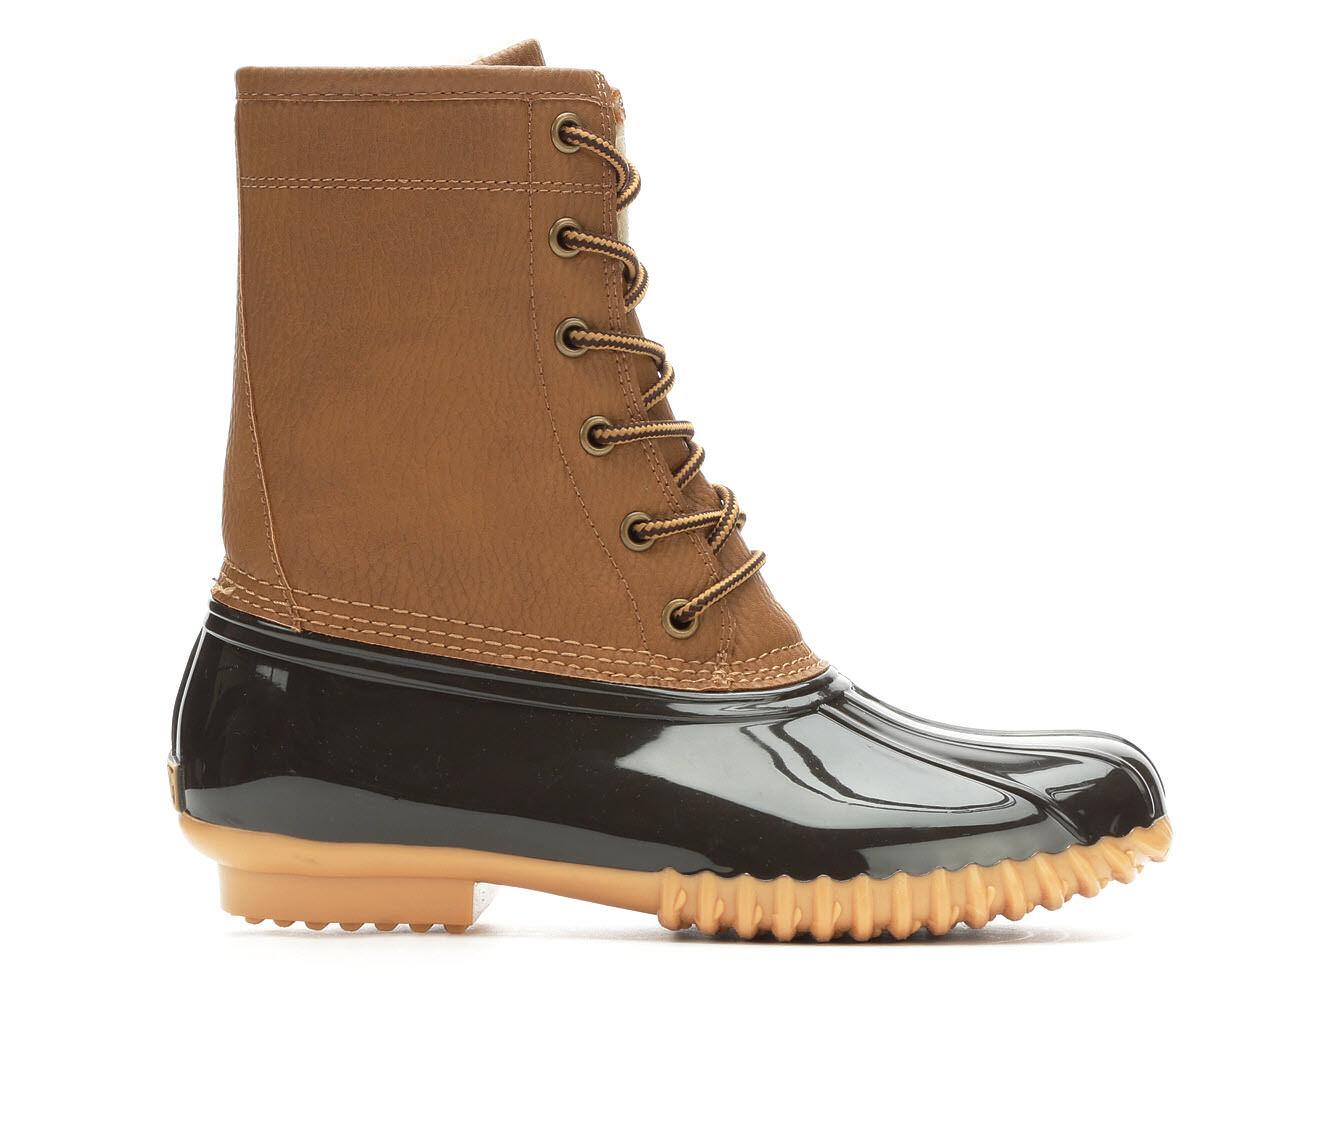 choose authentic Women's Sporto Dakota Duck Boots Brown/Tan